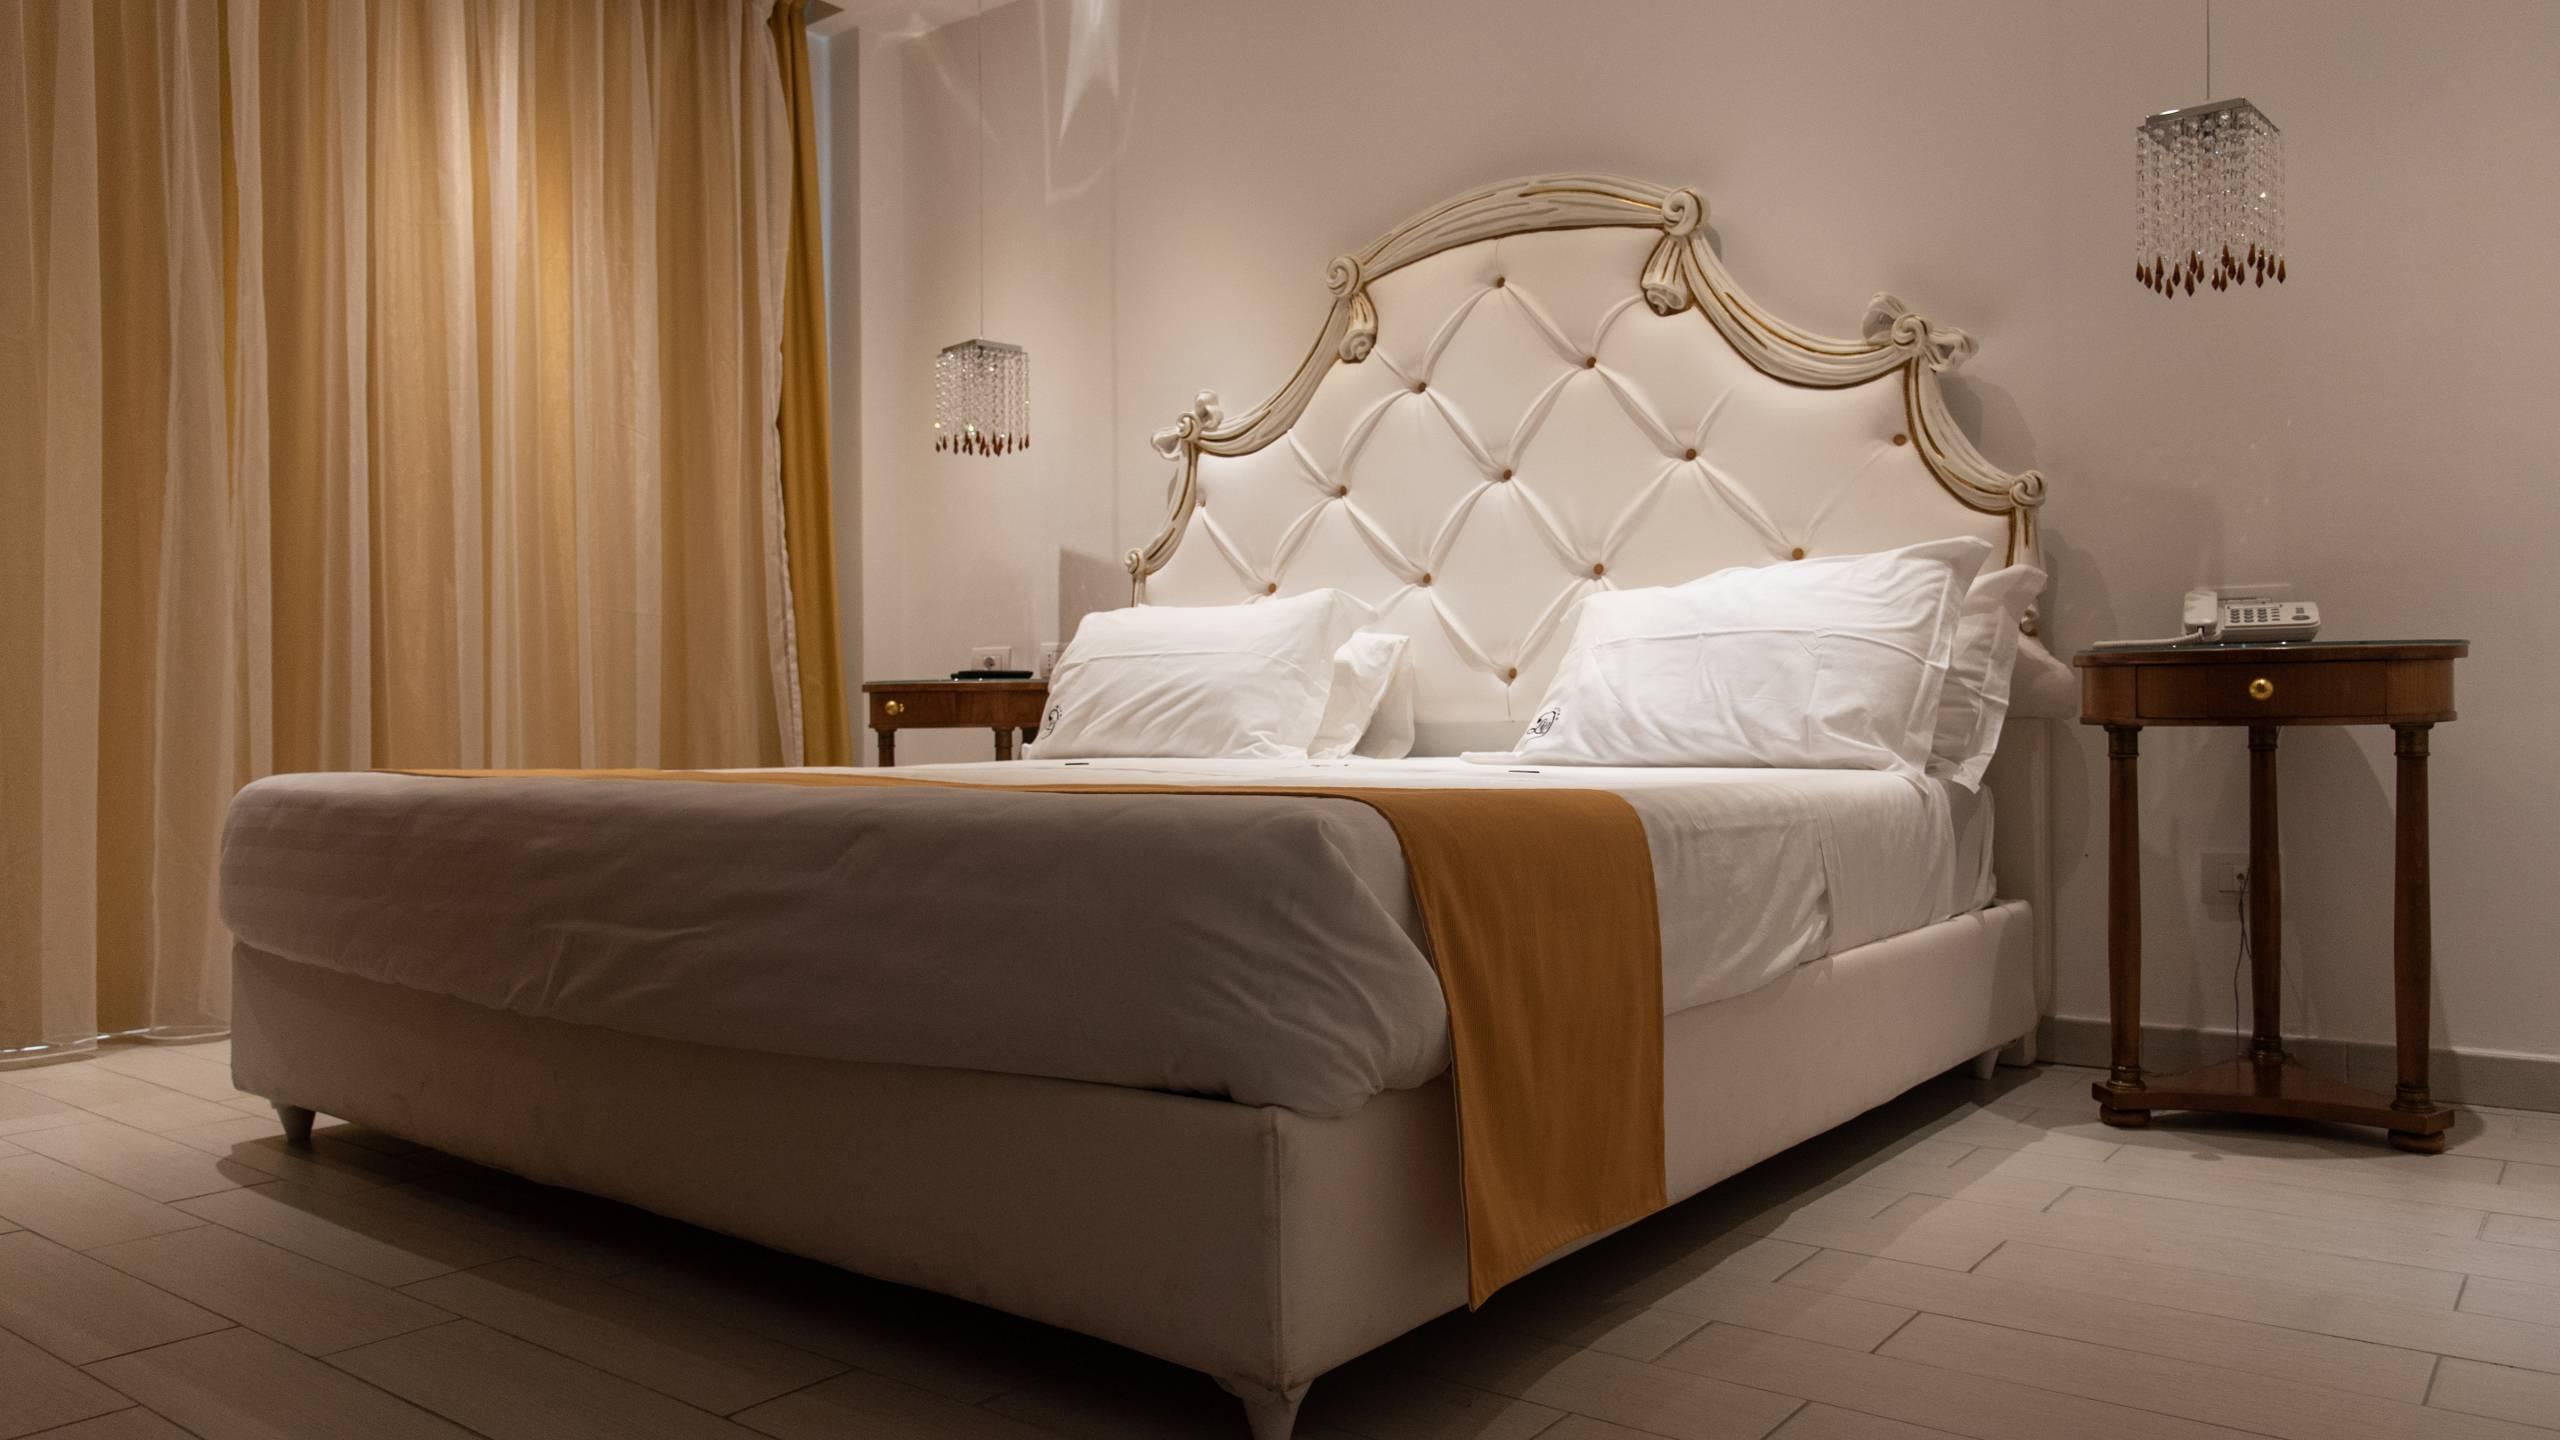 1-Hotel-Ludwig-Bolsena-suite-DSC-0537